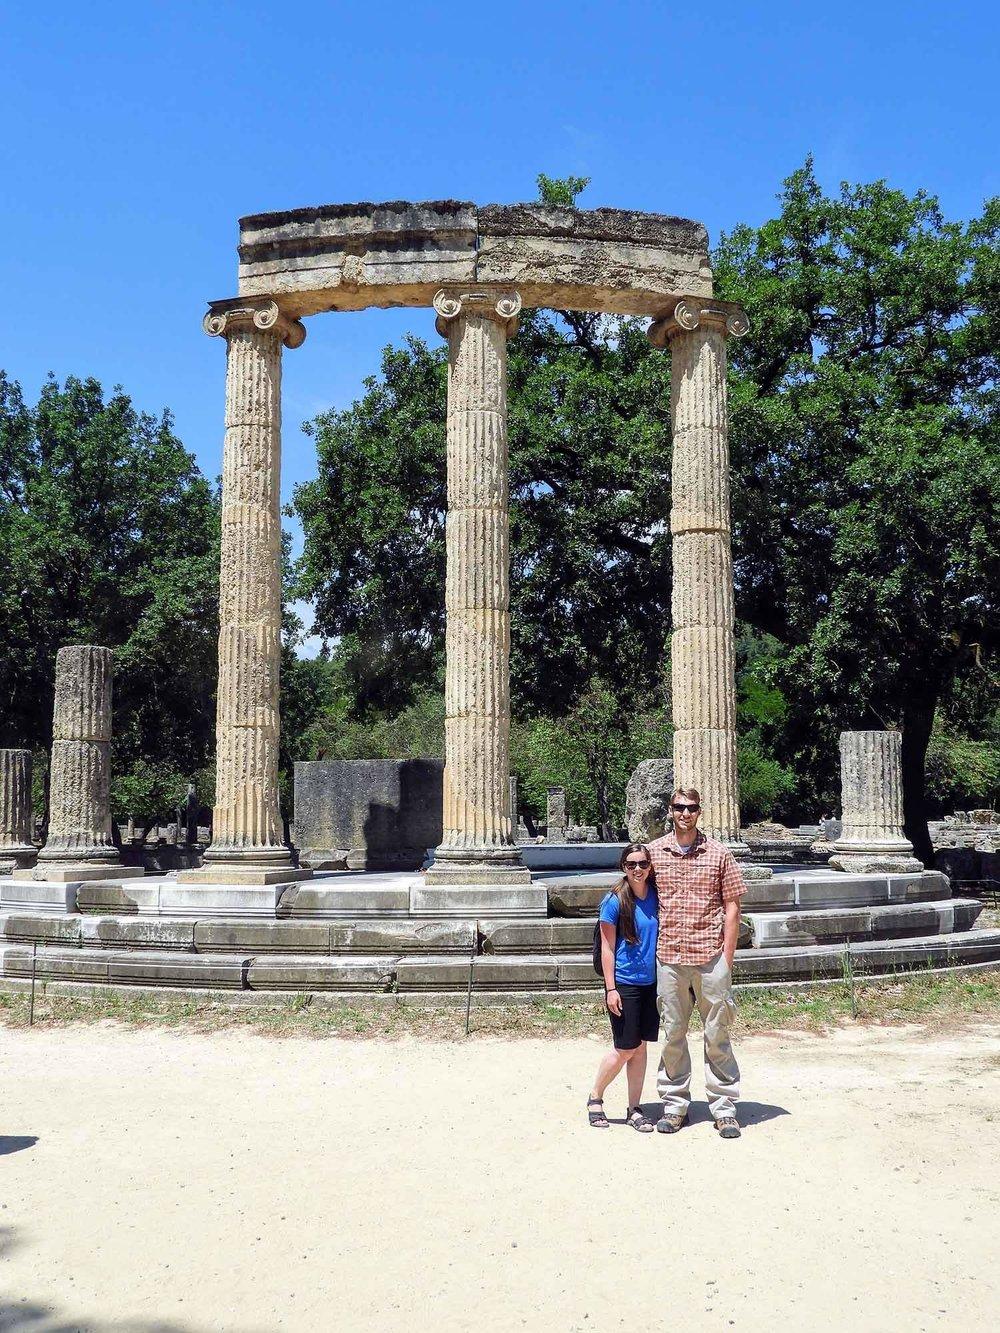 greece-olympia-ruins-olympic-columns-team.jpg